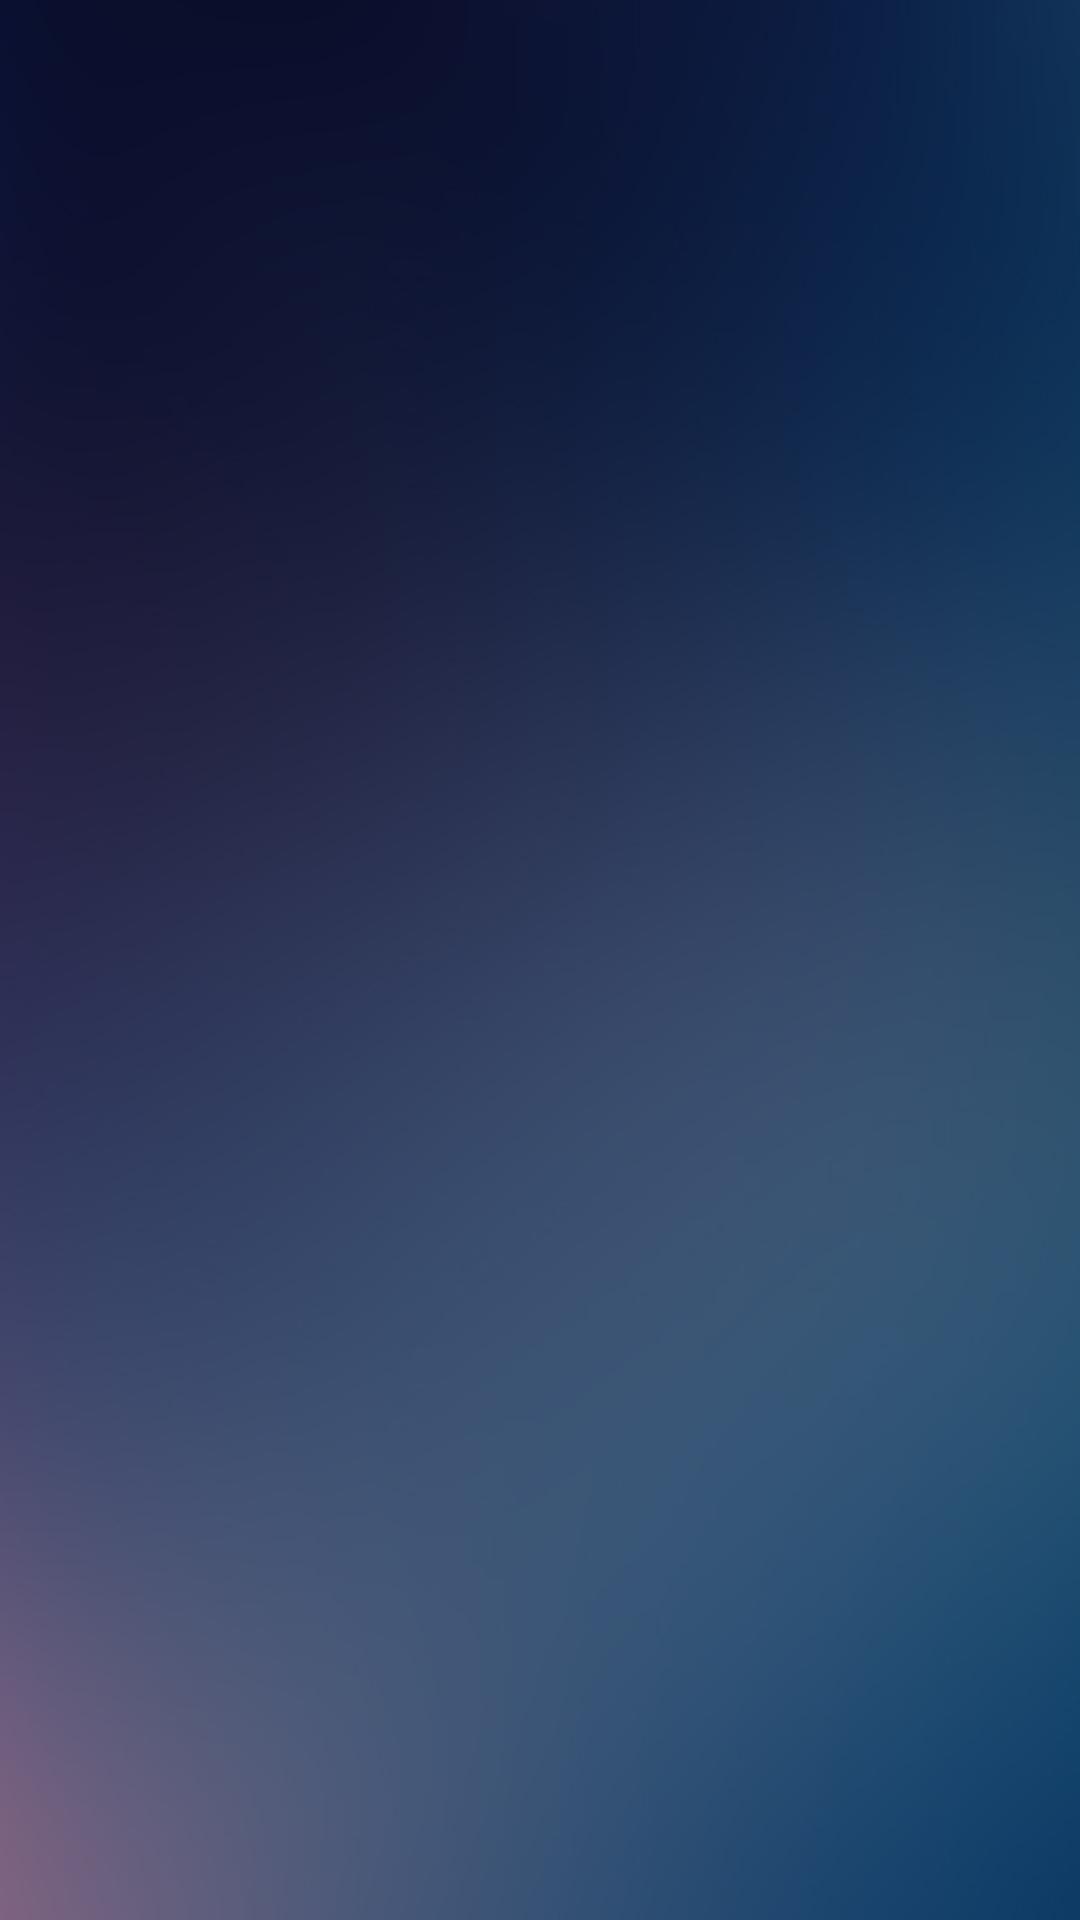 Samsung J7 Background Wallpaper